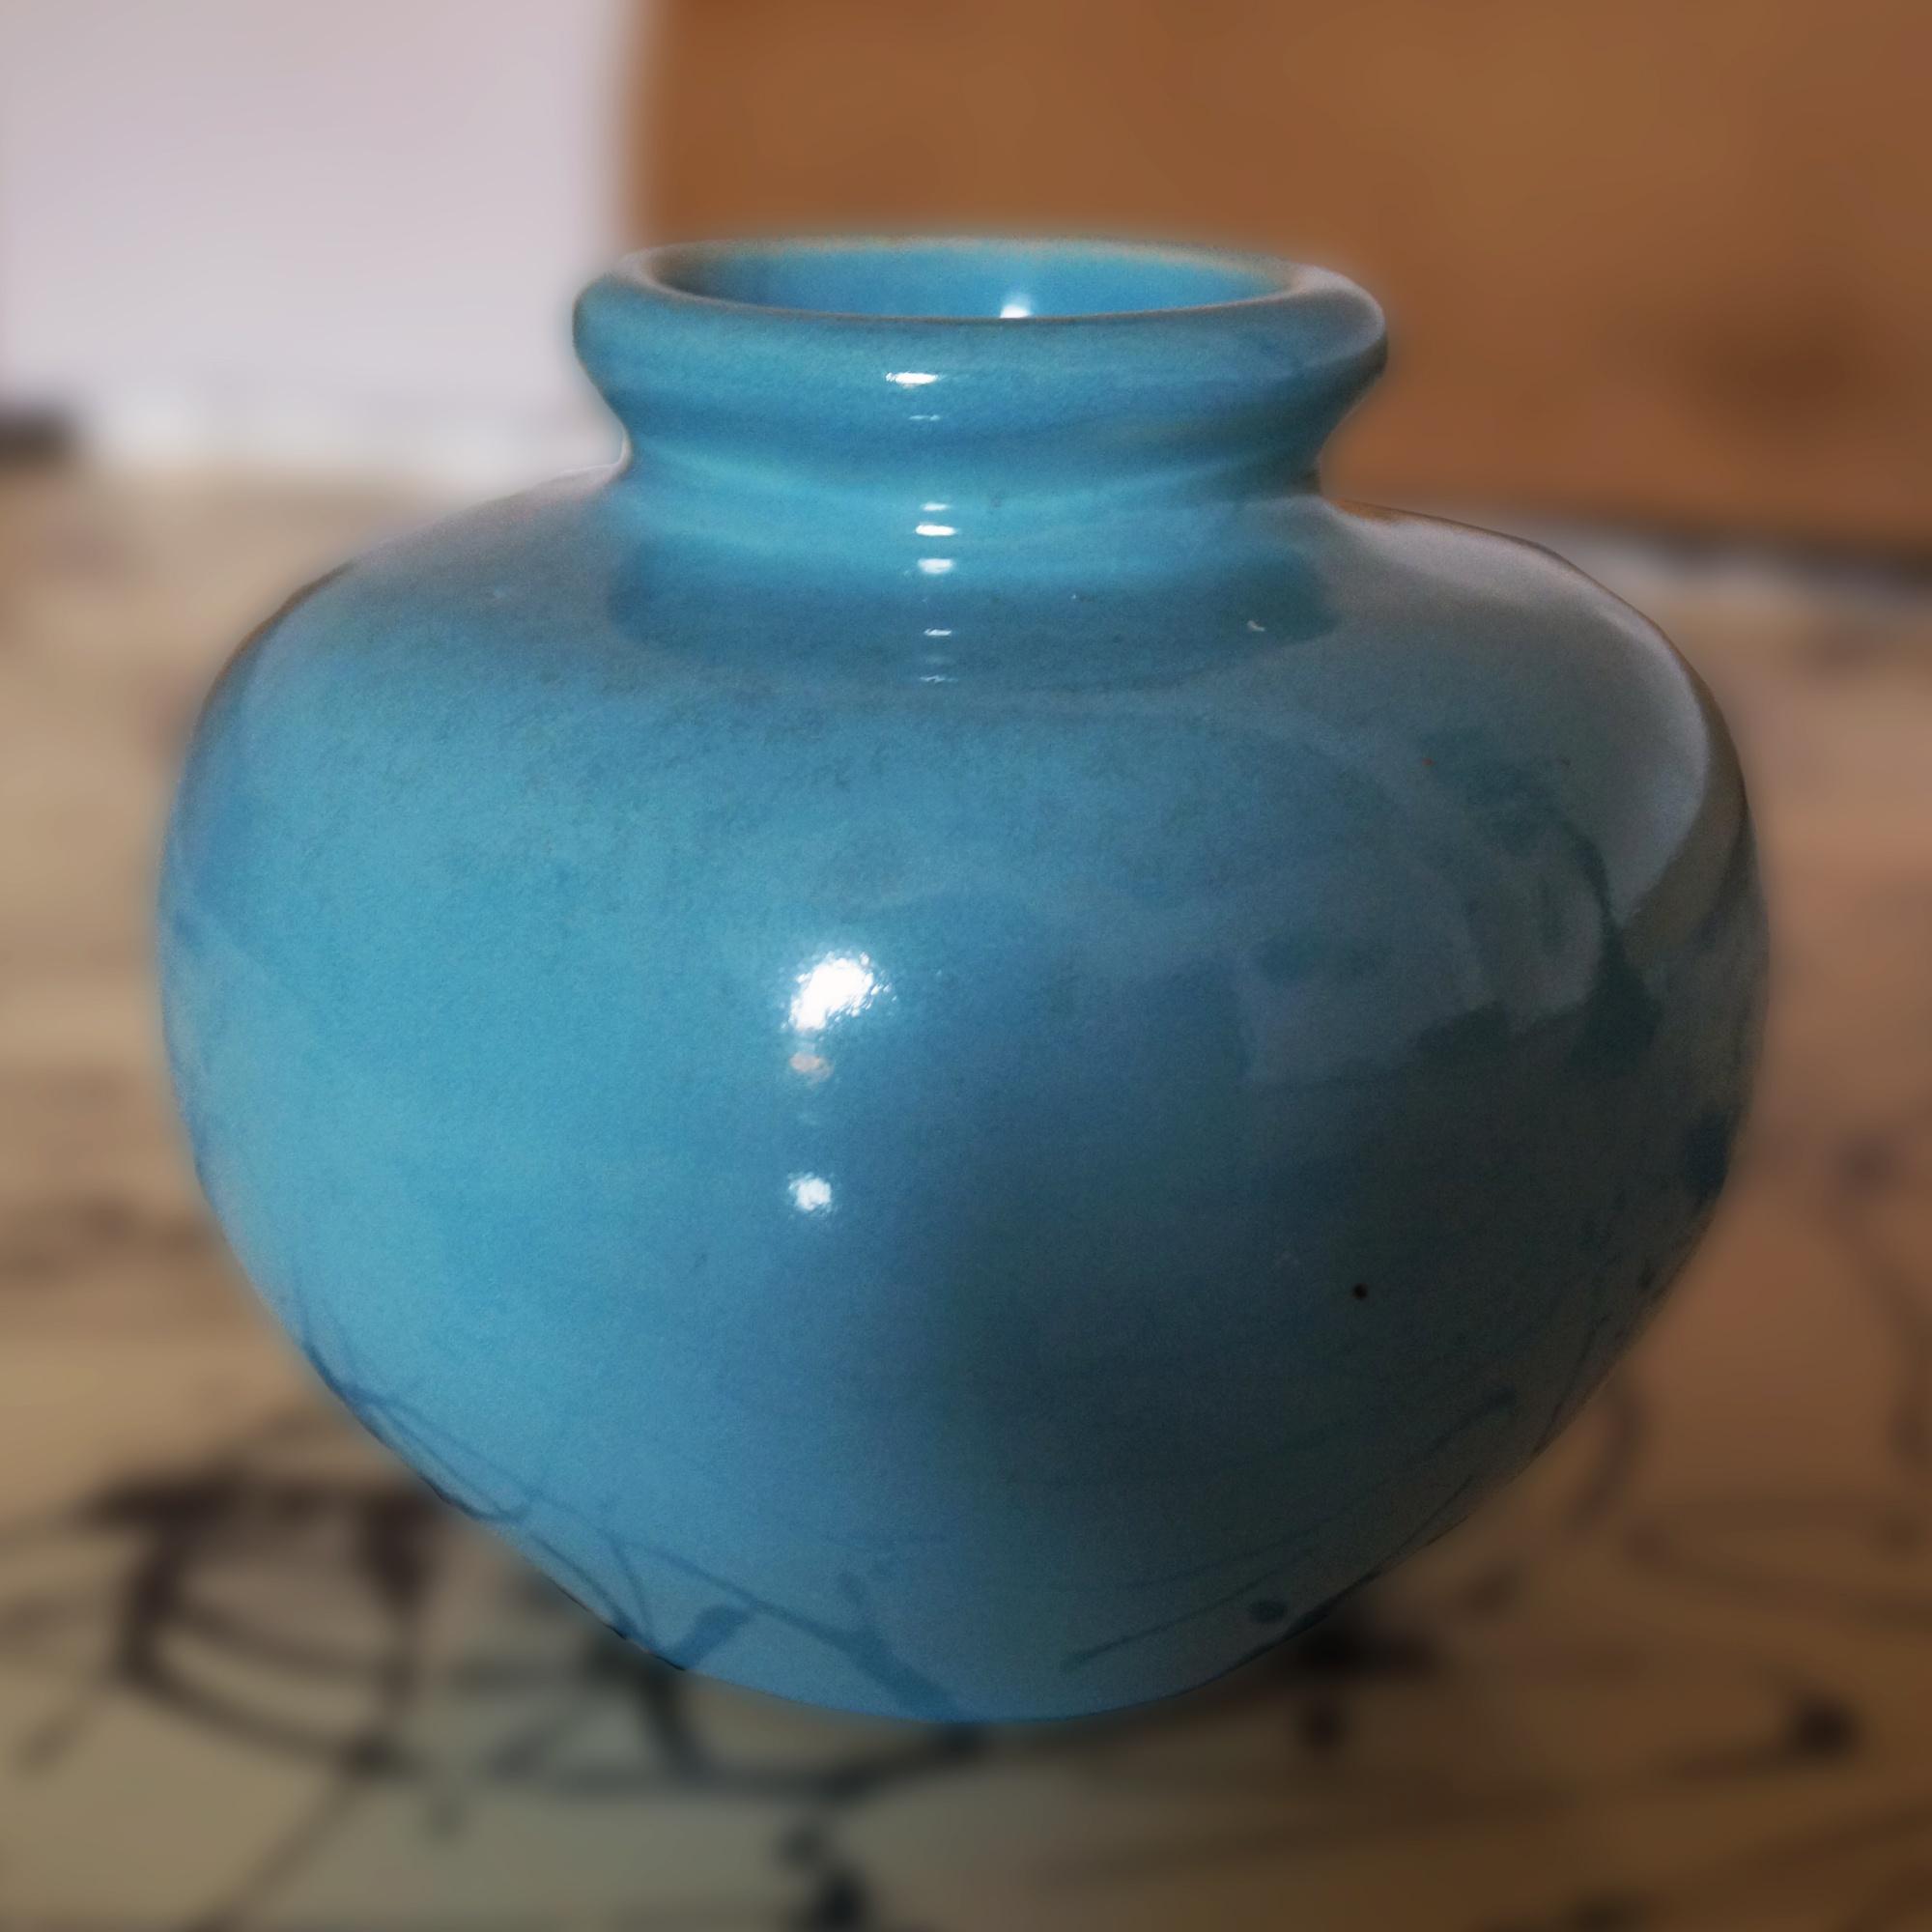 Hellblaue Vase aus Keramik